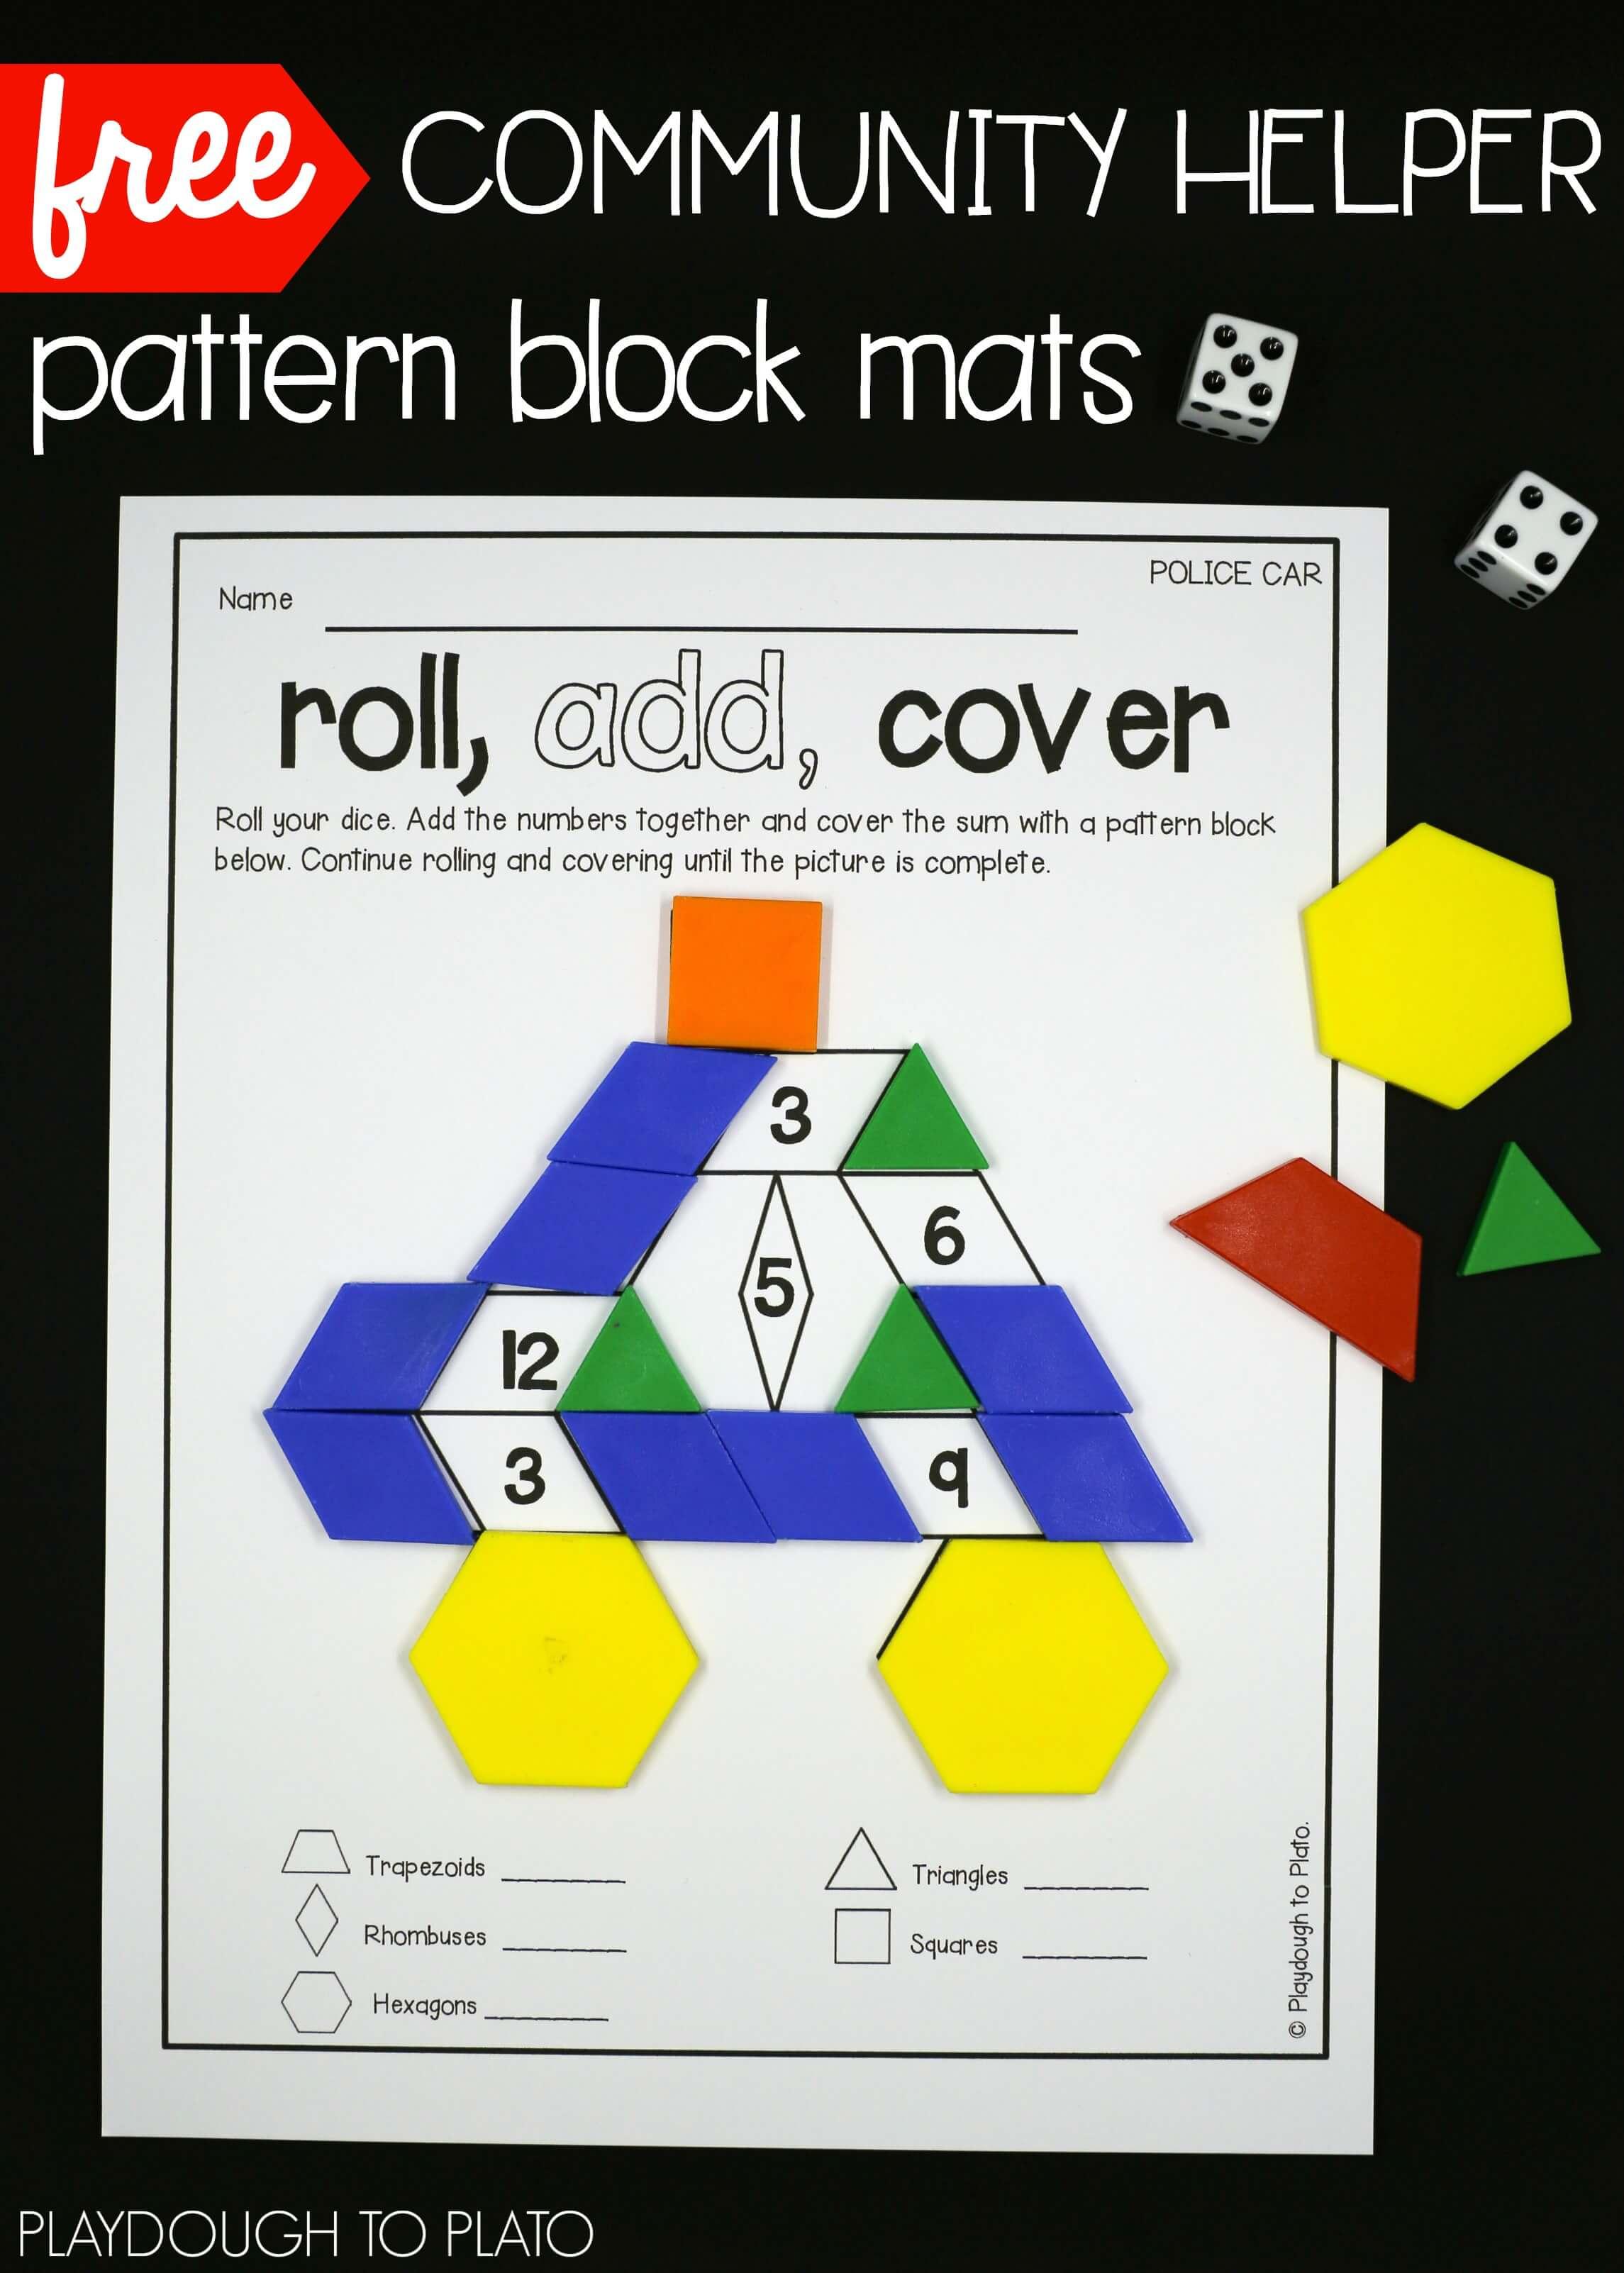 Pattern Block Mats Simple Inspiration Design